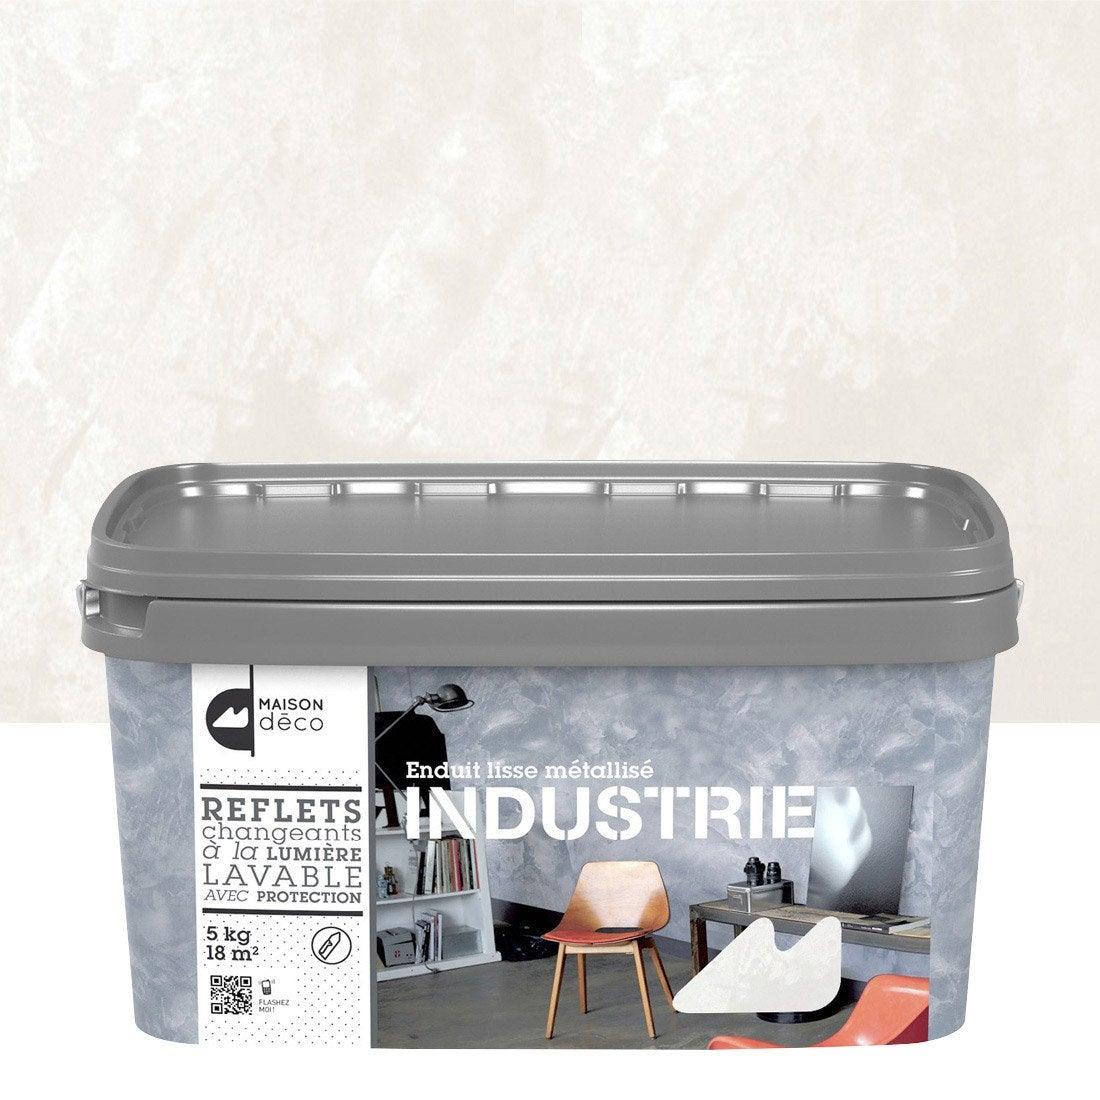 Peinture effet industrie maison deco titane 5 kg leroy merlin - Peinture salon leroy merlin ...